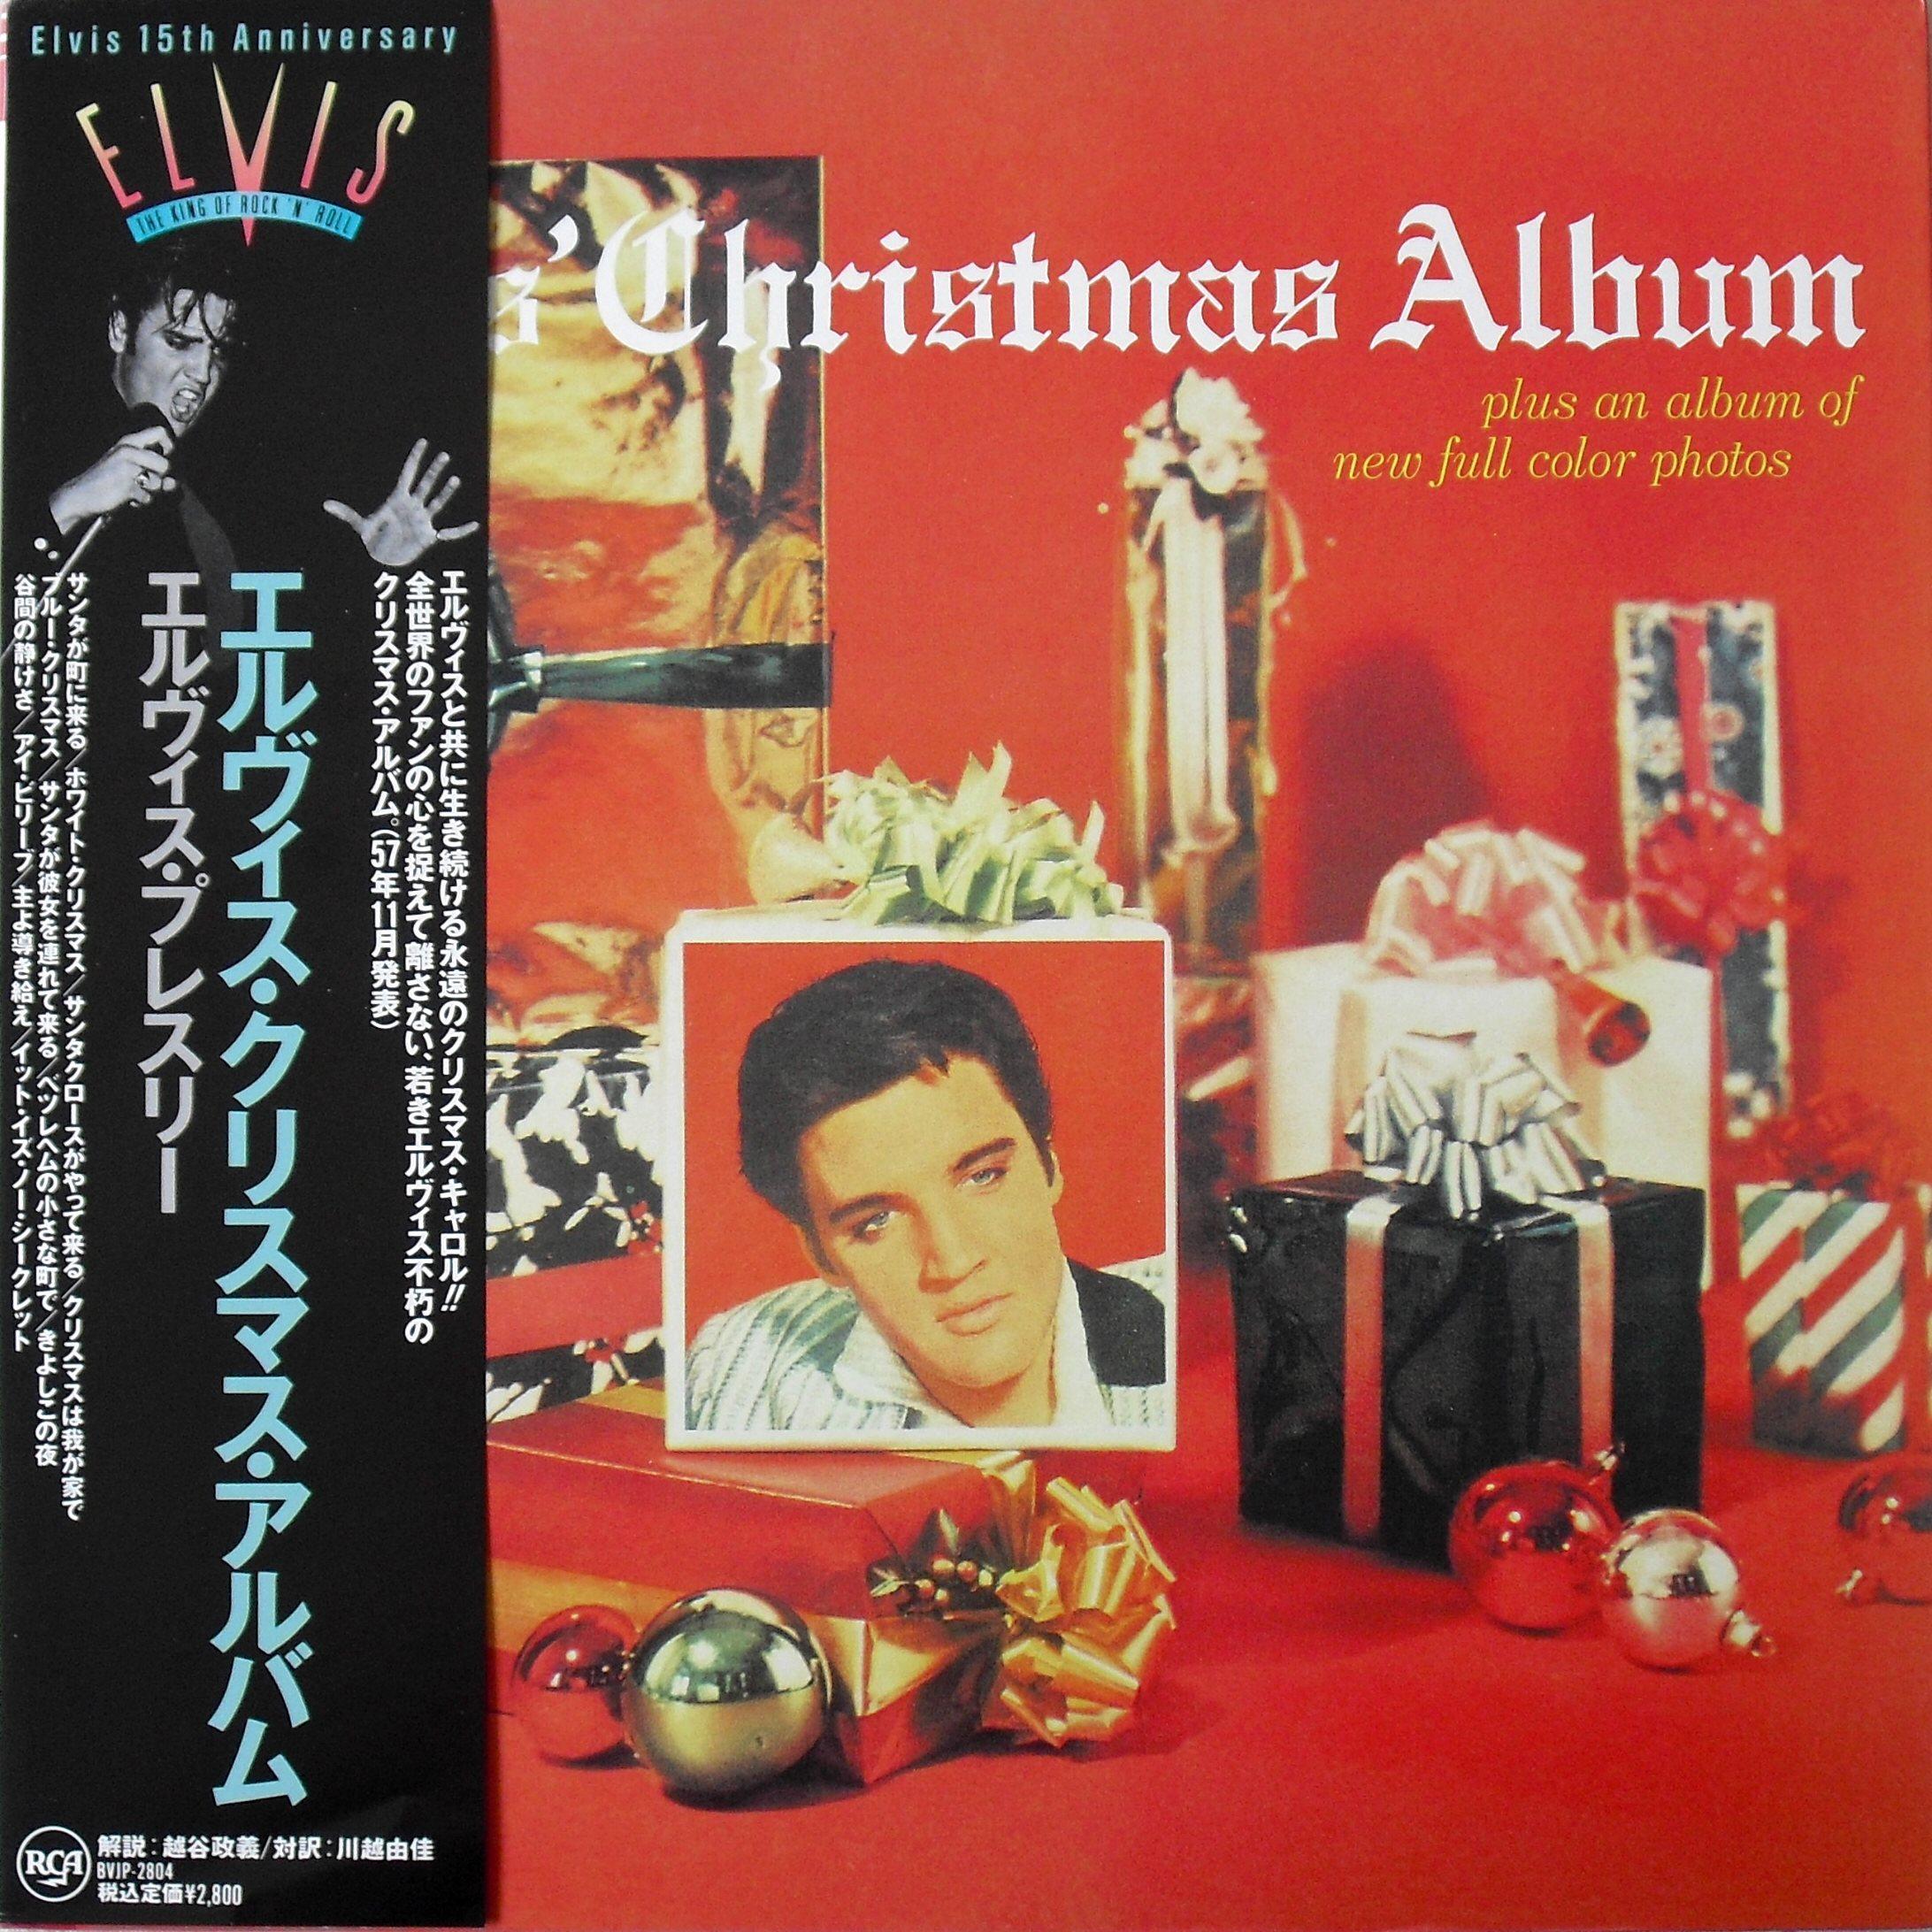 ELVIS' CHRISTMAS ALBUM 0117ujk